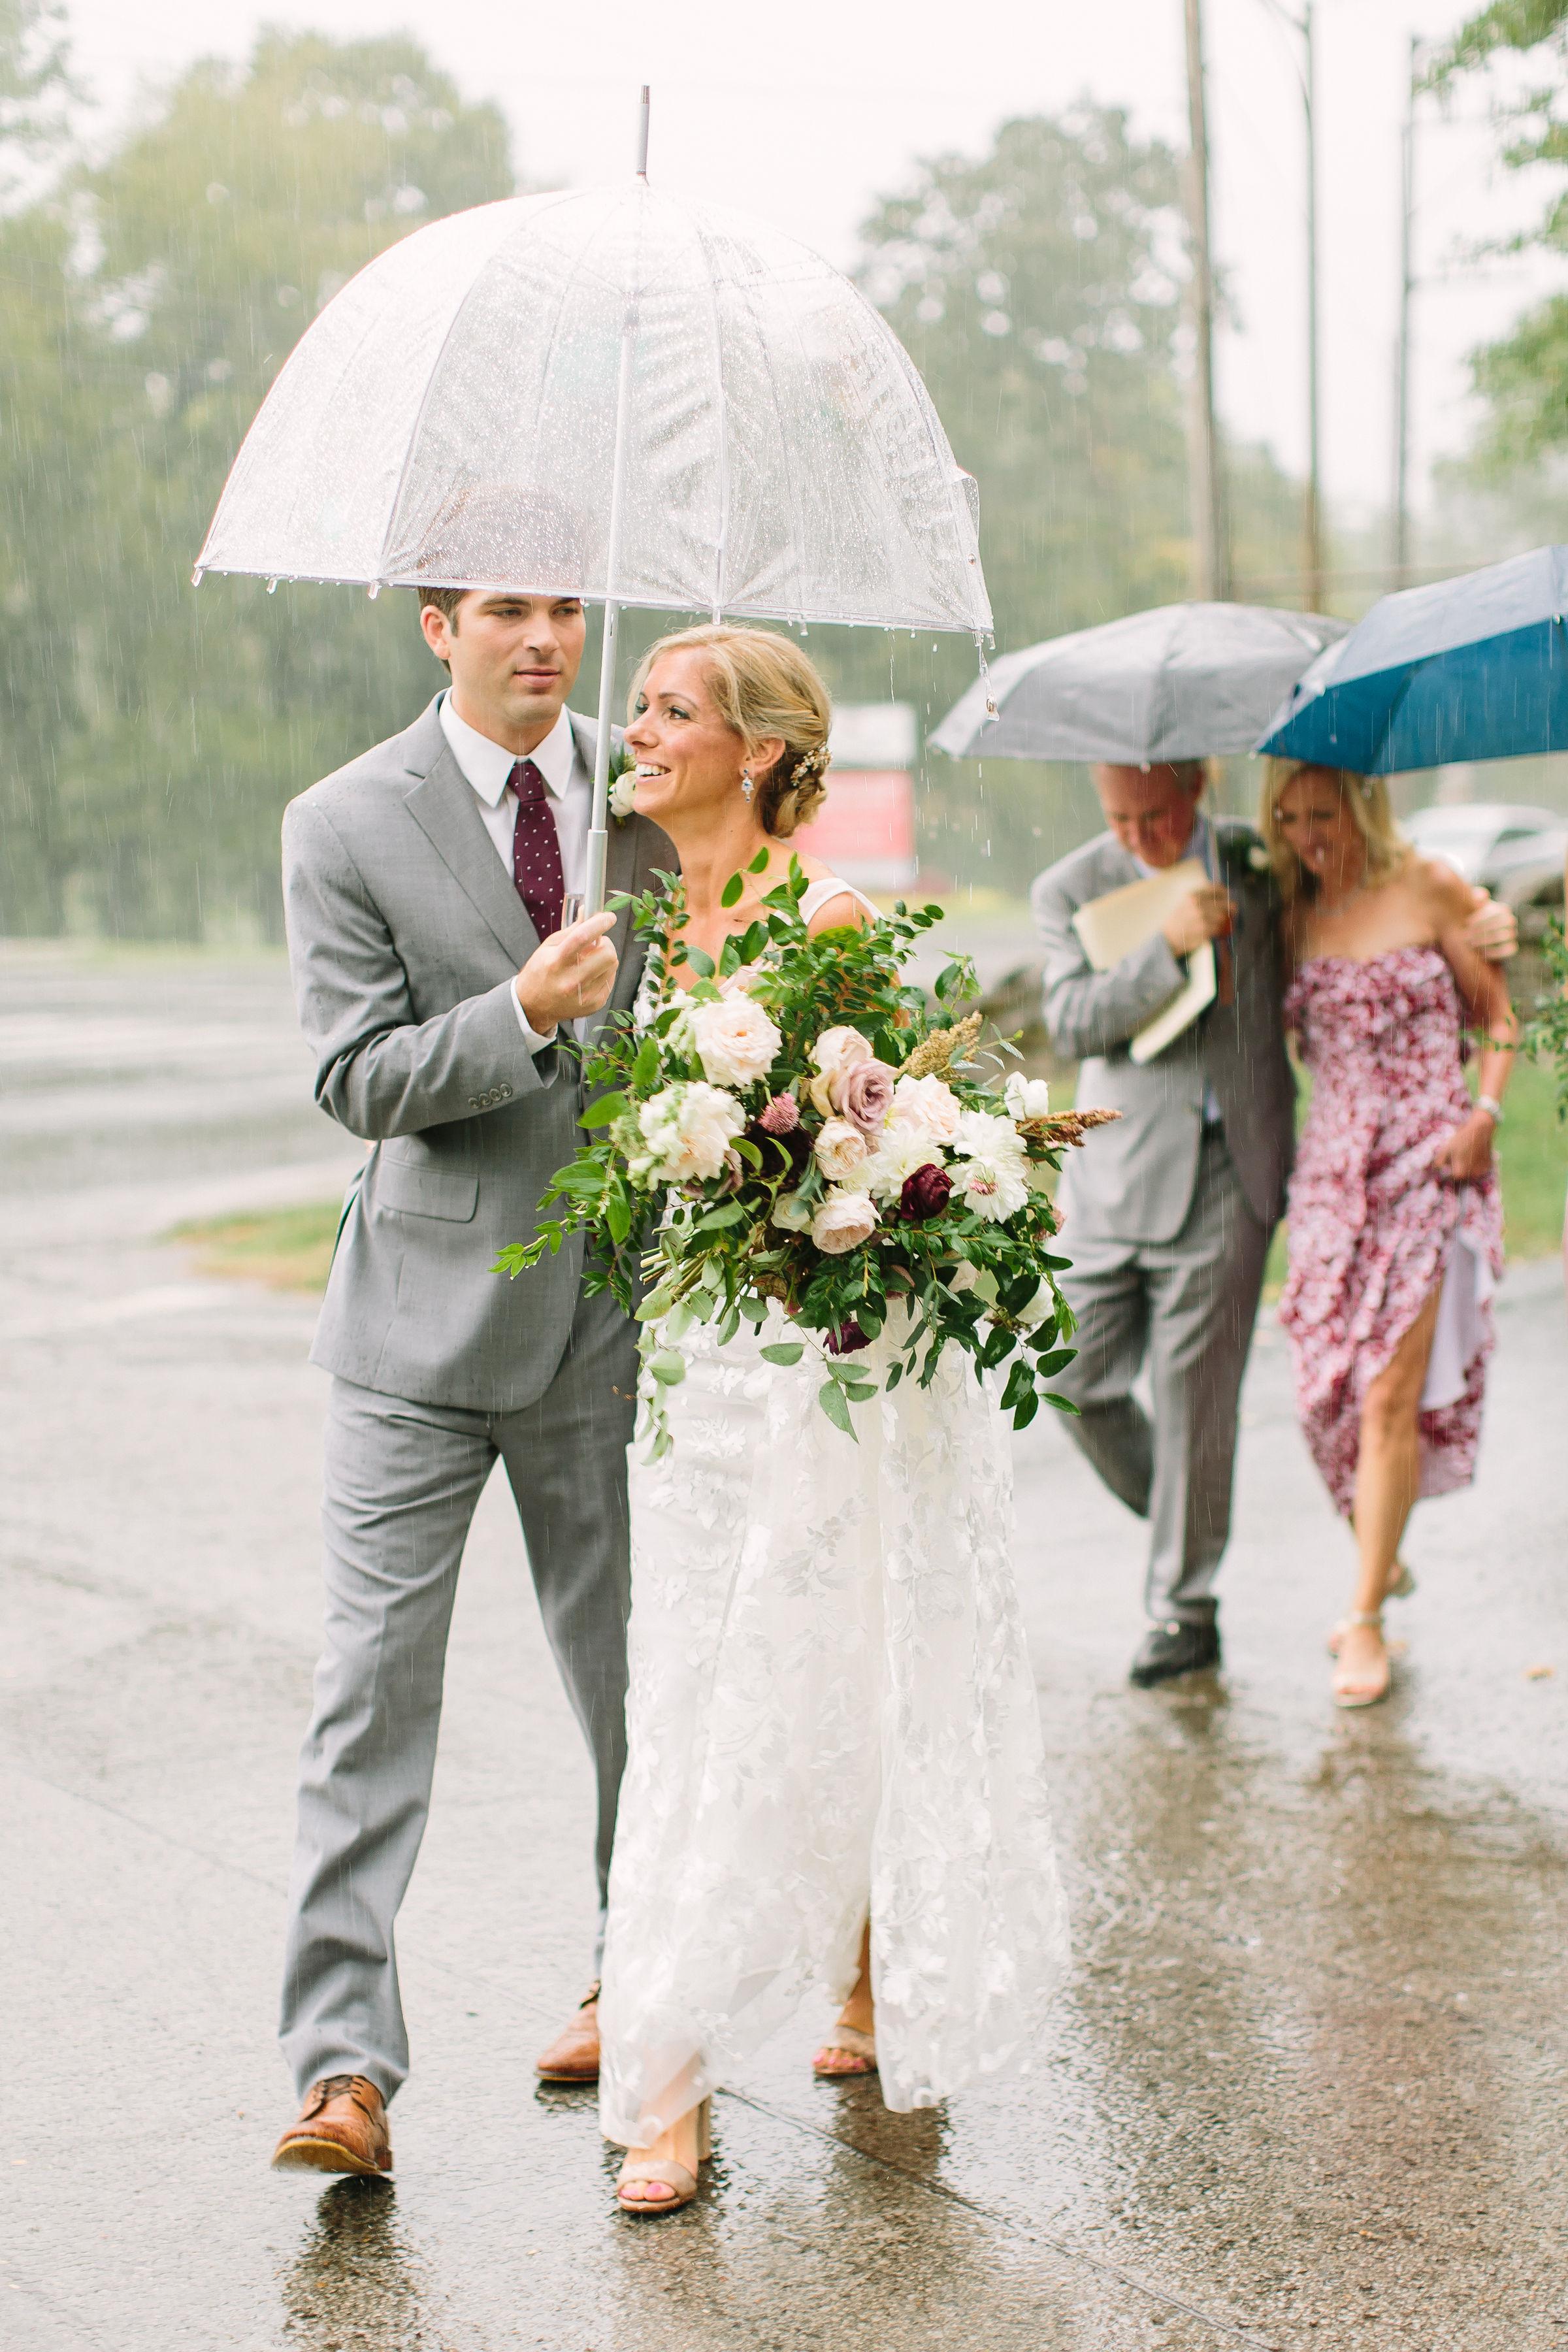 New Orleans style wedding parade in the rain // Nashville Wedding Florist